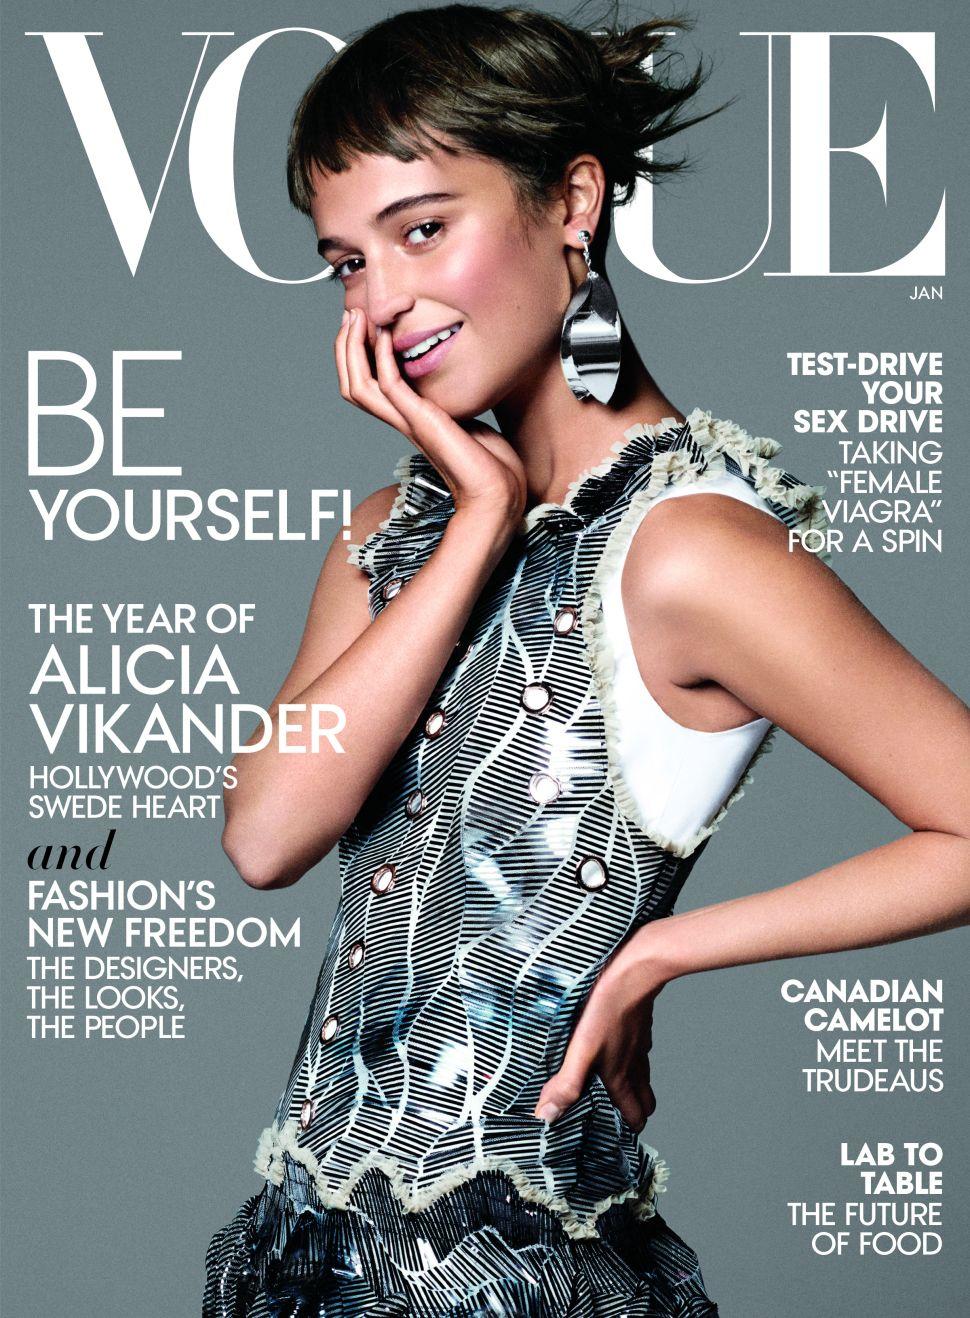 Rising Star Alicia Vikander Lands Vogue's January Cover